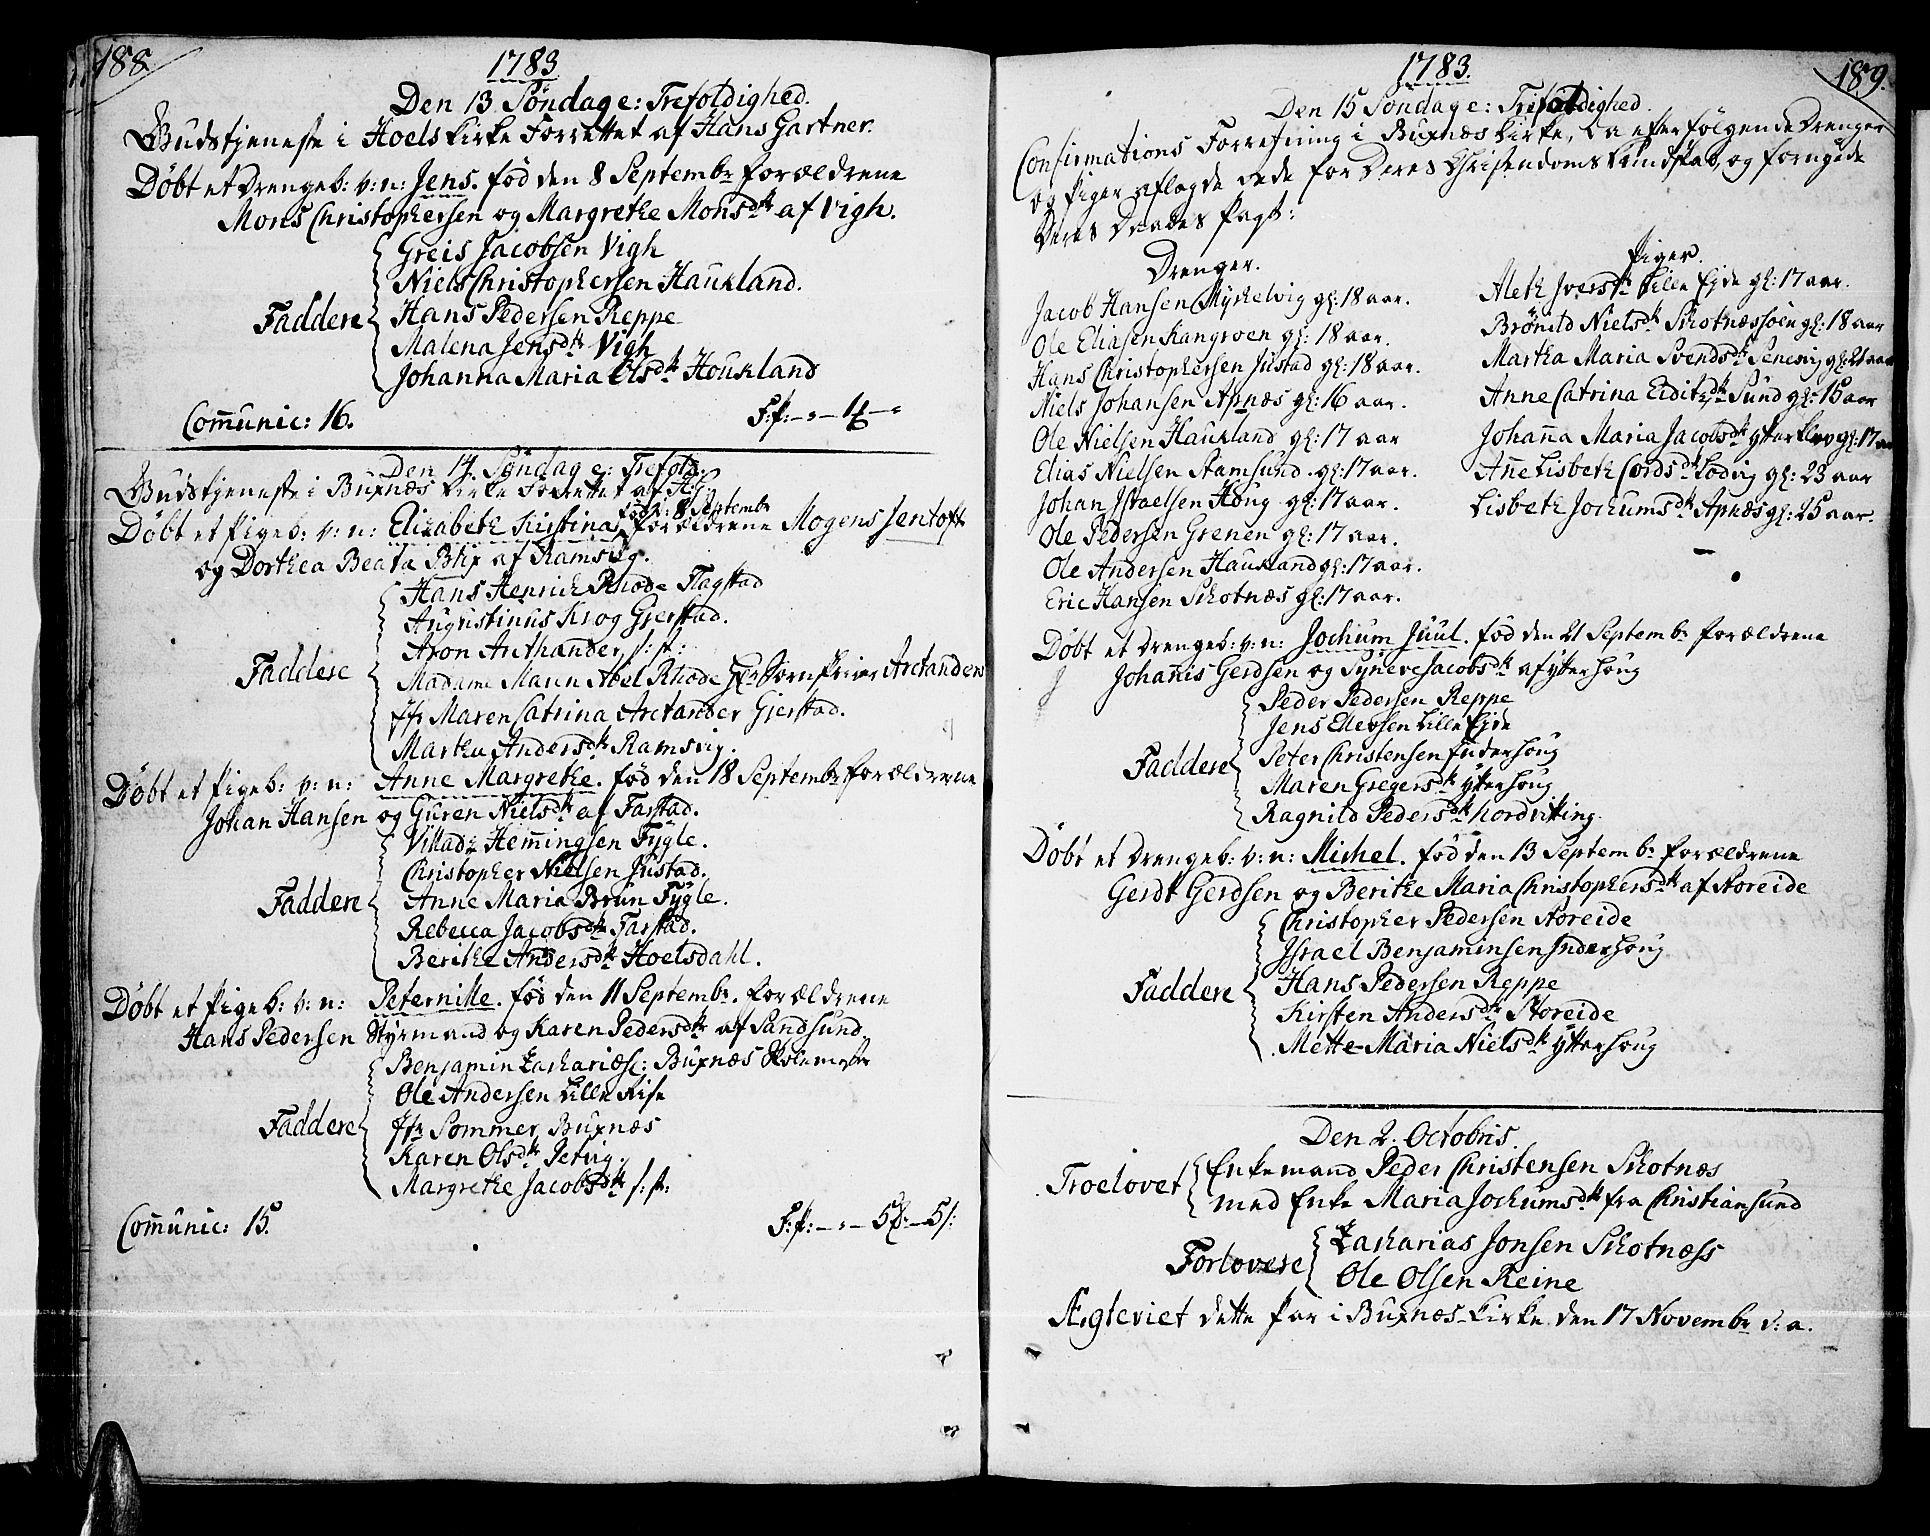 SAT, Ministerialprotokoller, klokkerbøker og fødselsregistre - Nordland, 881/L1149: Ministerialbok nr. 881A02, 1773-1793, s. 188-189